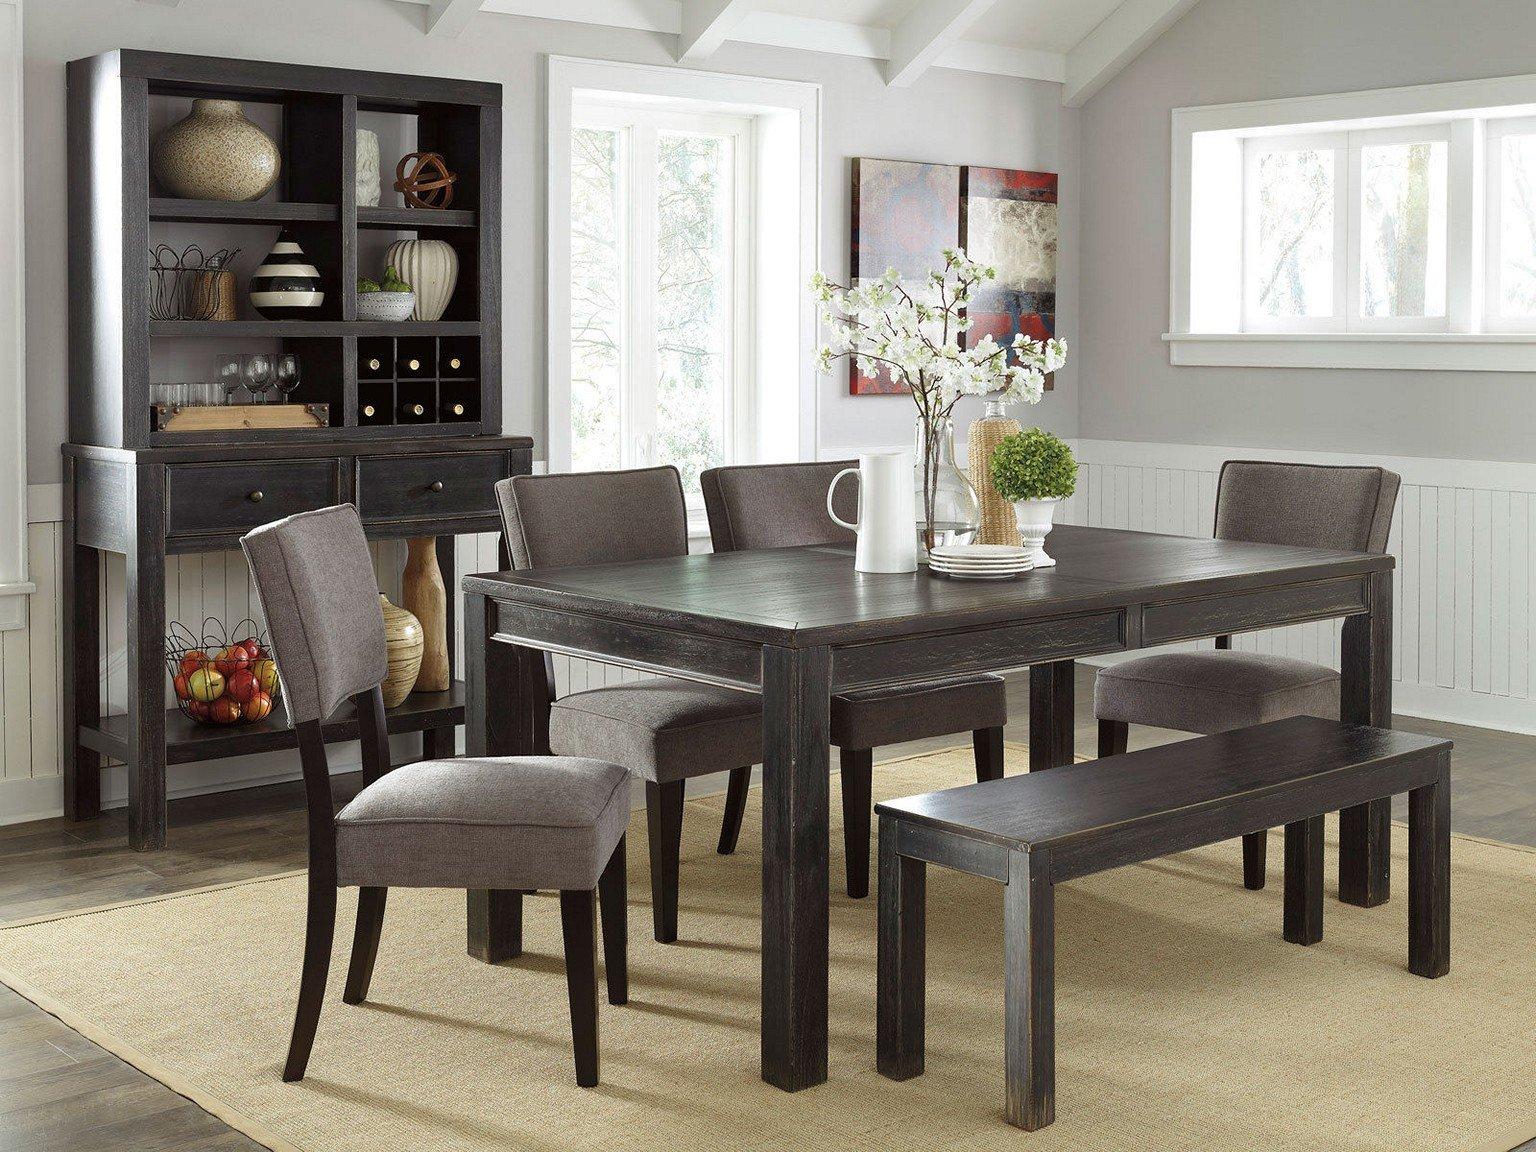 Small dining room 10 nimvo interior design luxury - Small dining room ideas on a budget ...